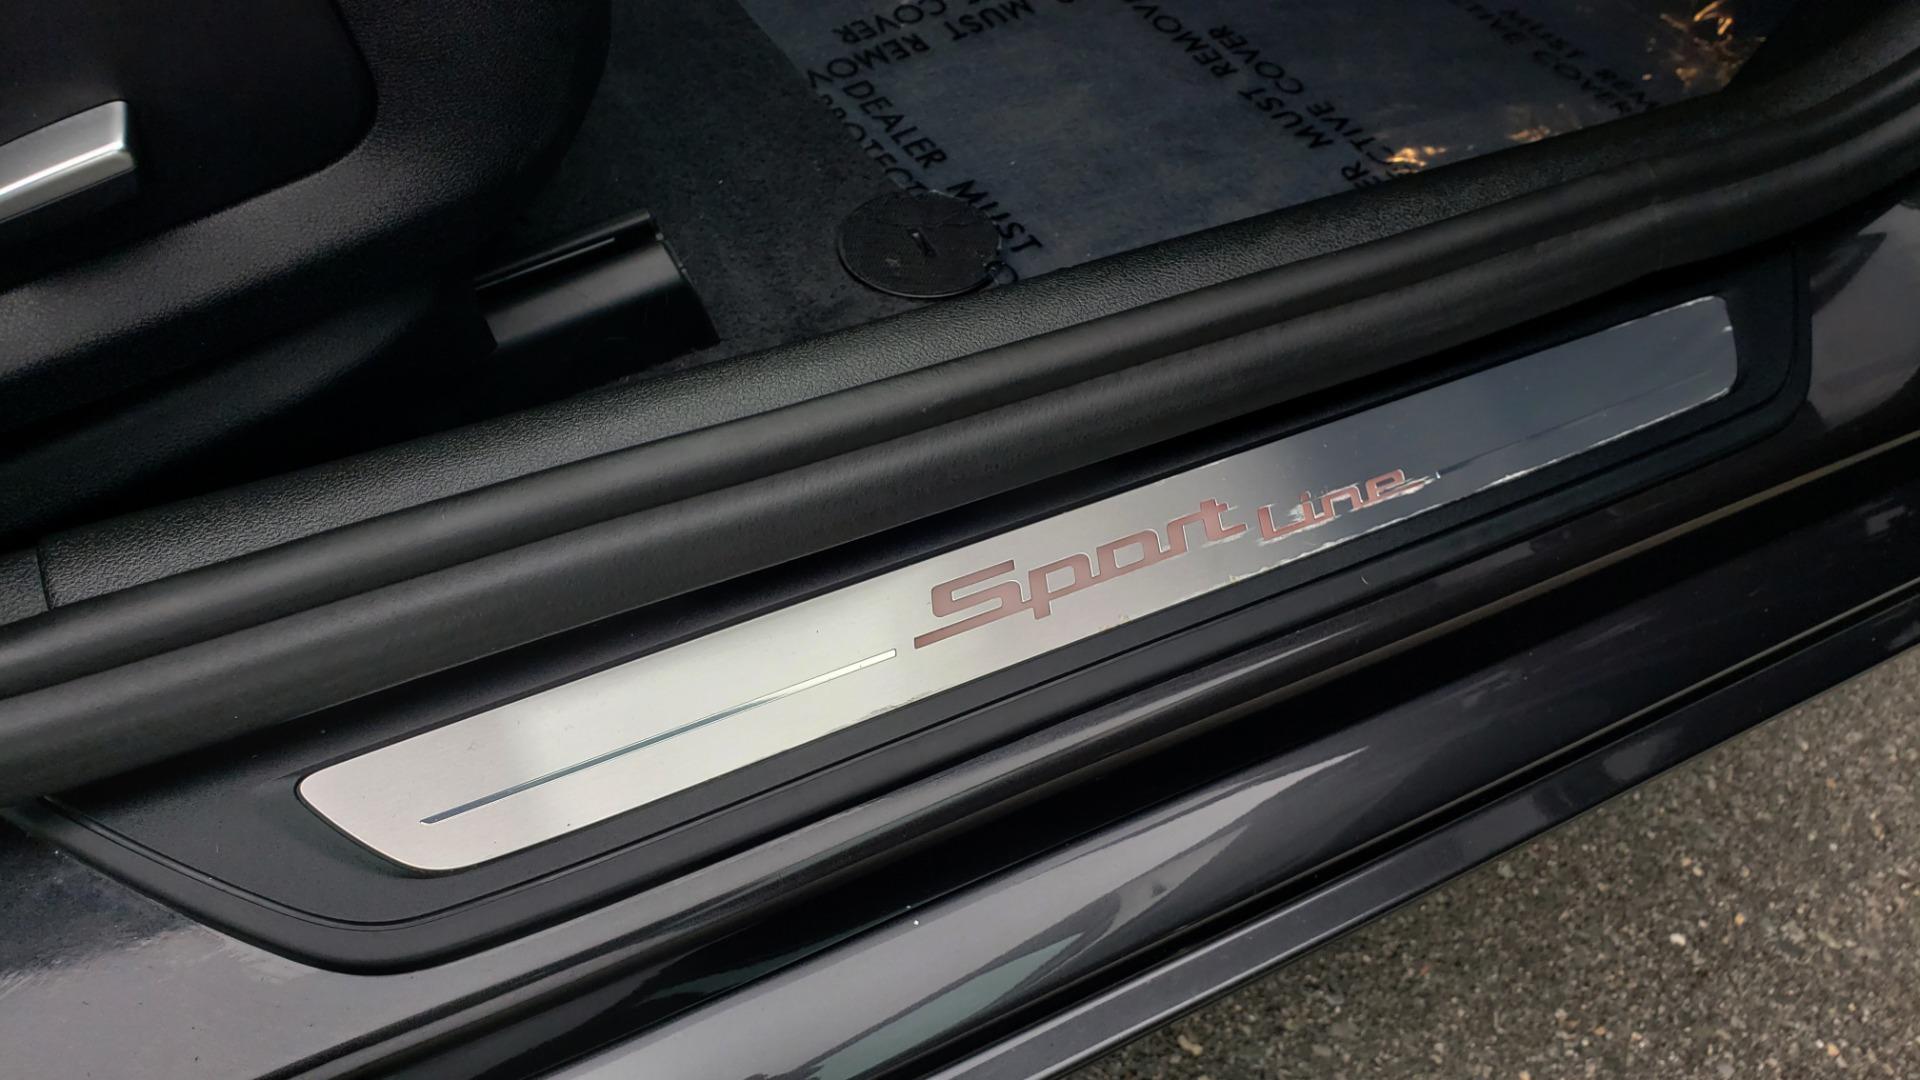 Used 2017 BMW 5 SERIES 530IXDRIVE / PREM PKG / DRVR ASST PLUS / CLD WTHR / APPLE CARPLAY for sale Sold at Formula Imports in Charlotte NC 28227 67